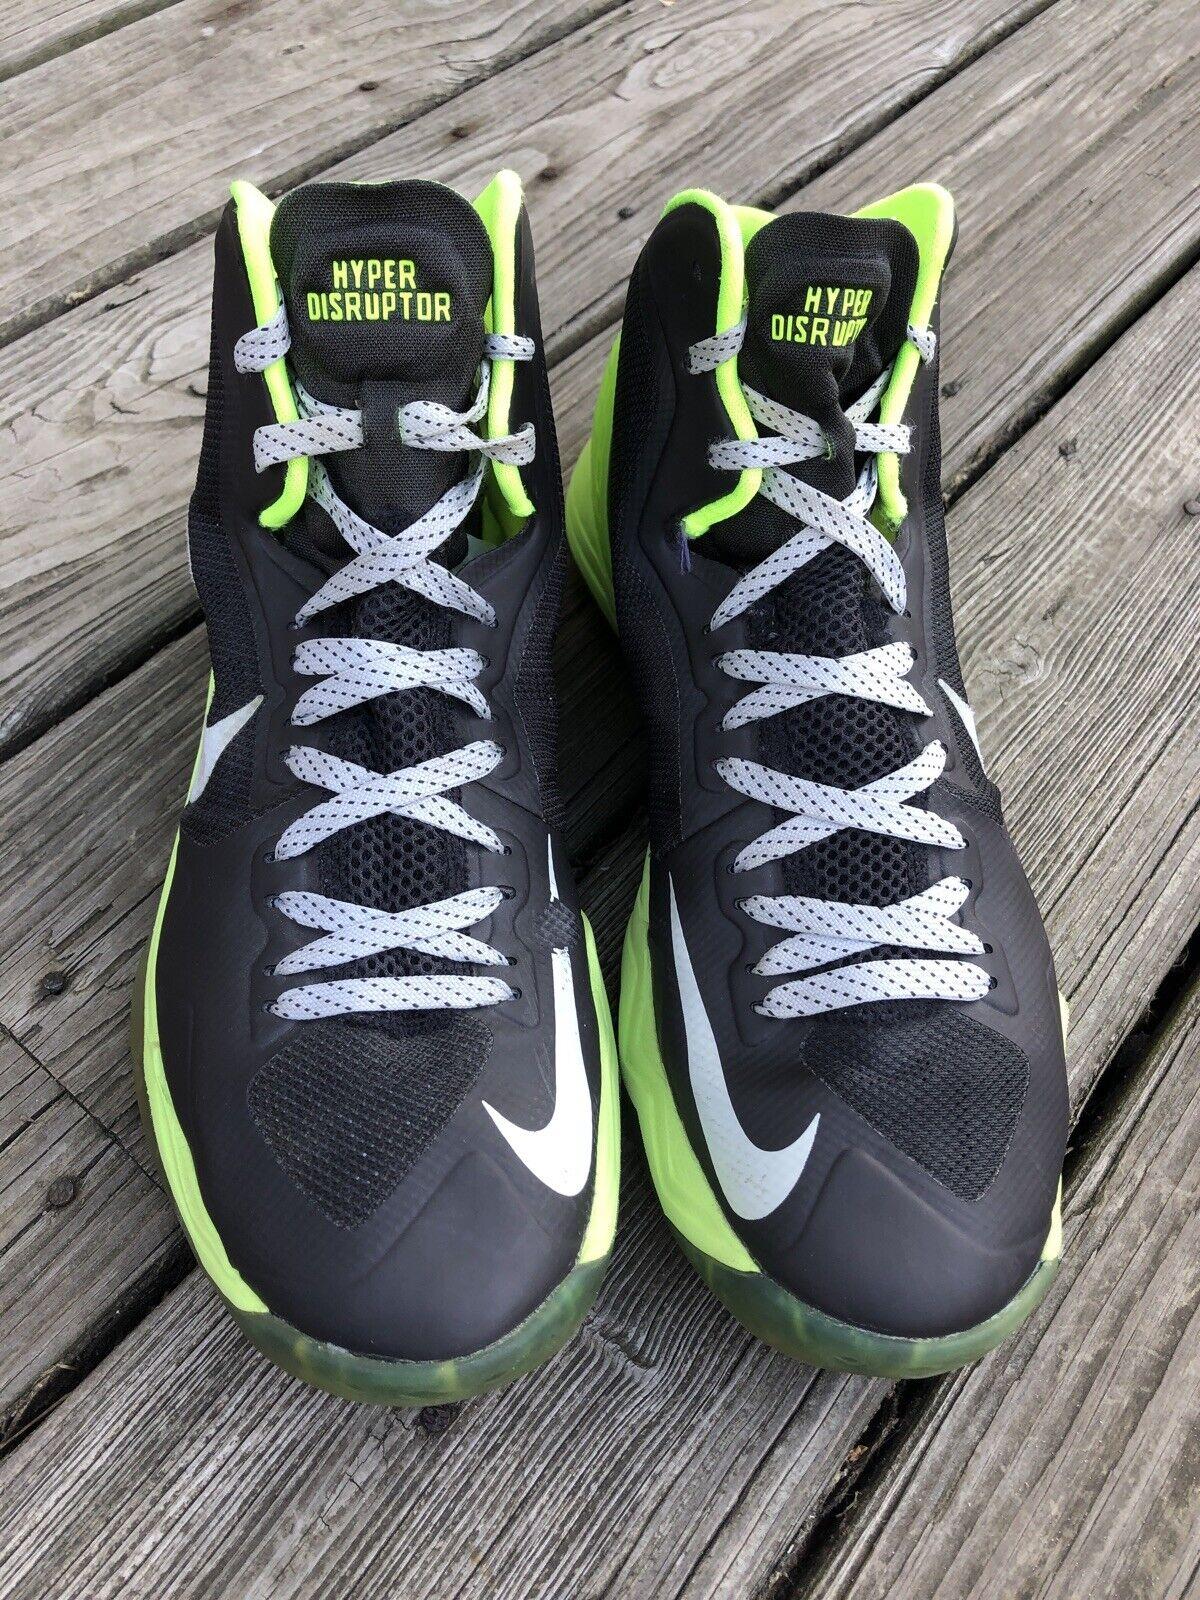 Nike Zoom Hyper Disruptor Basketball